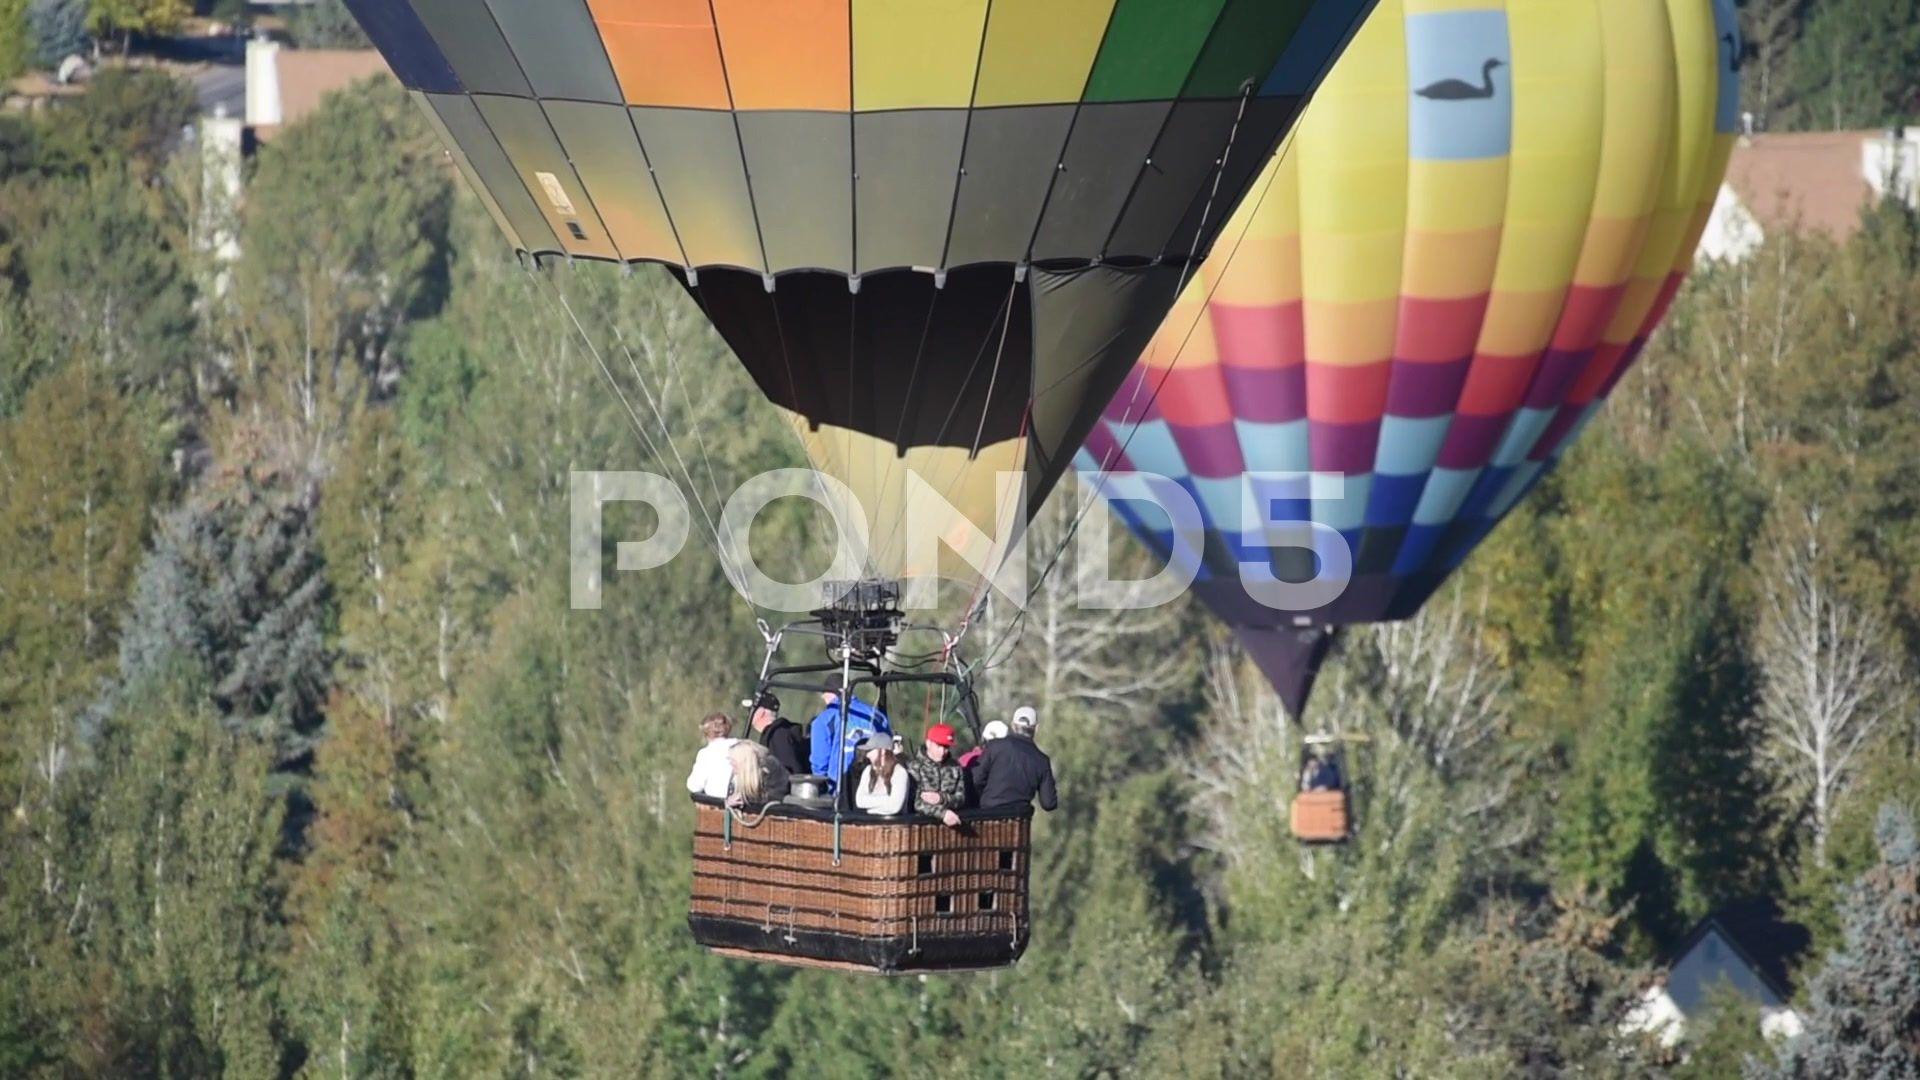 People enjoying a hot air balloon ride Aloft Balloon